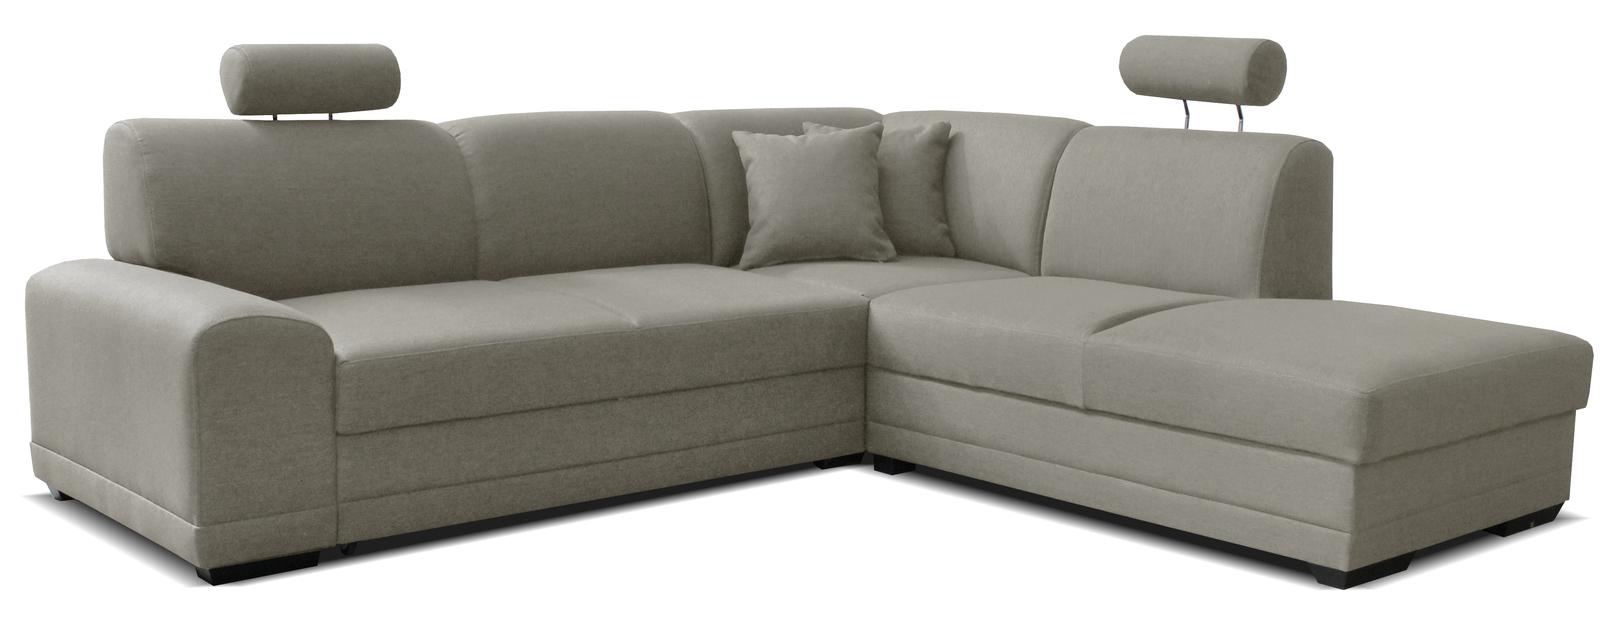 Rohová sedačka - Famm - Laon II 2F+L (P) svetlosivá